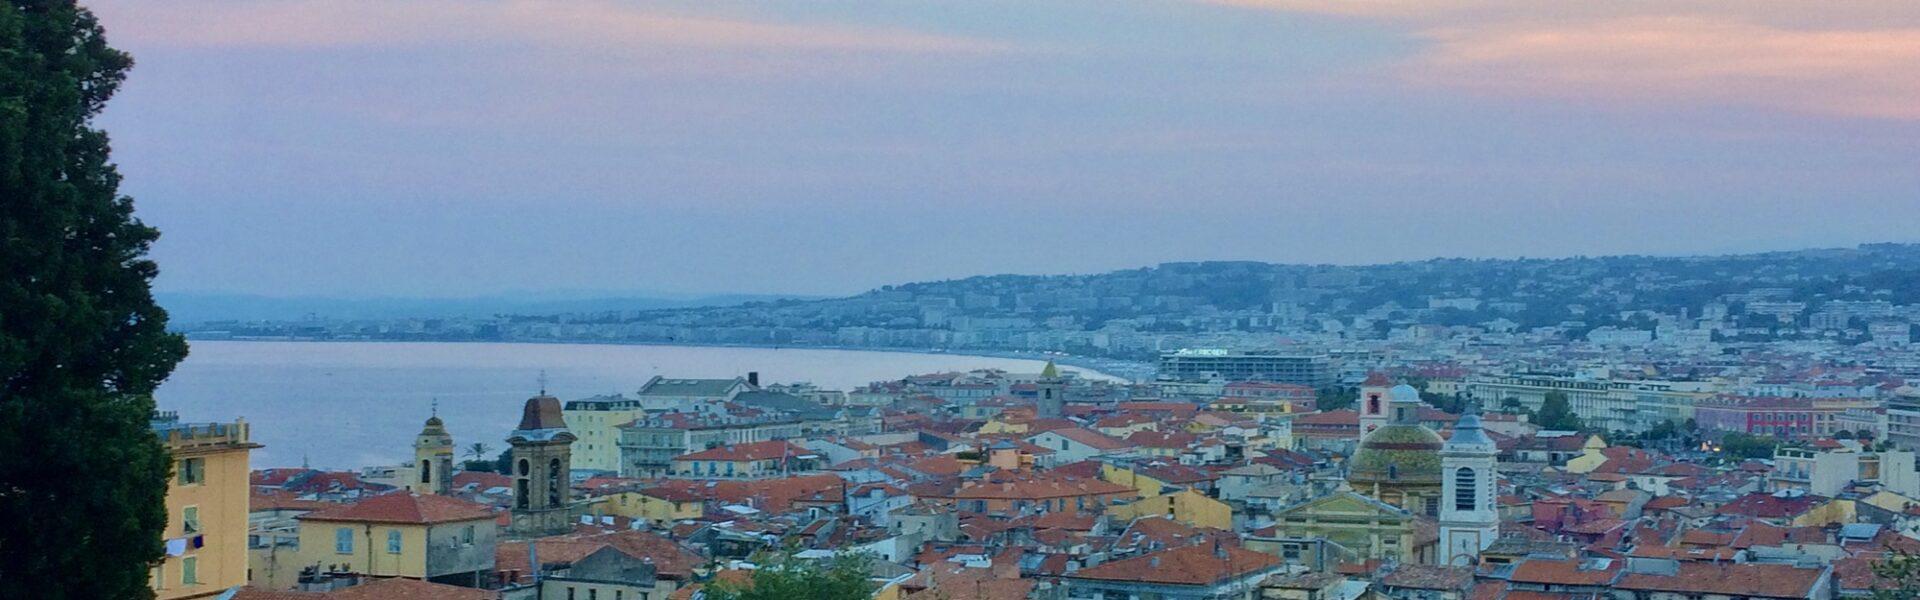 Nice et ses proches alentours - Panorama sur Nice